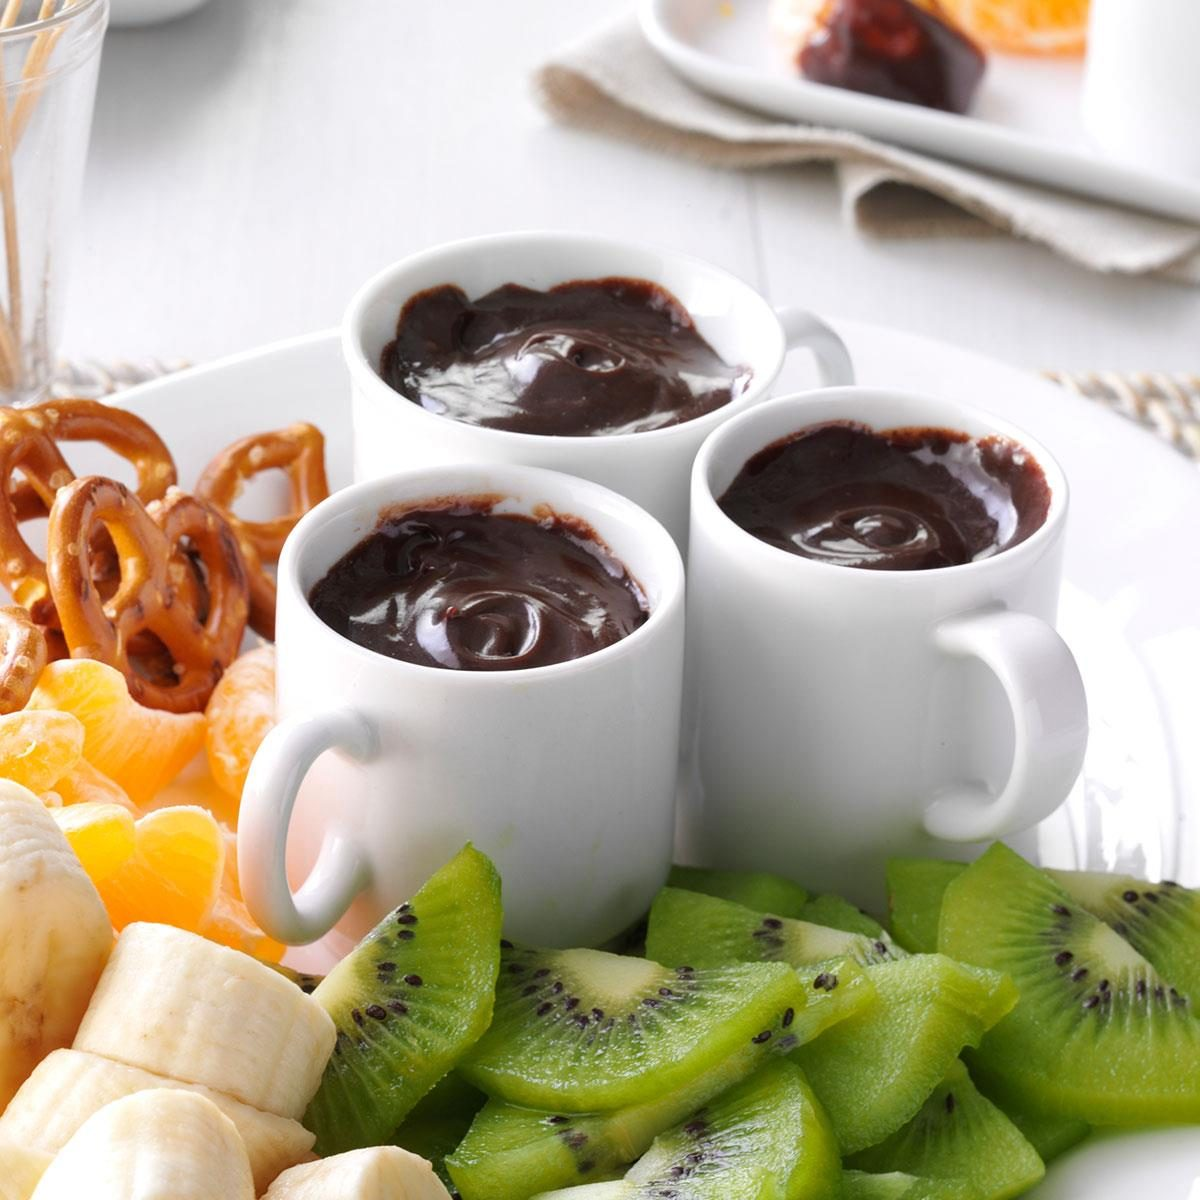 Chocolate Fondue Fountain Recipe - Pumpkin Chocolate Chip Cookies